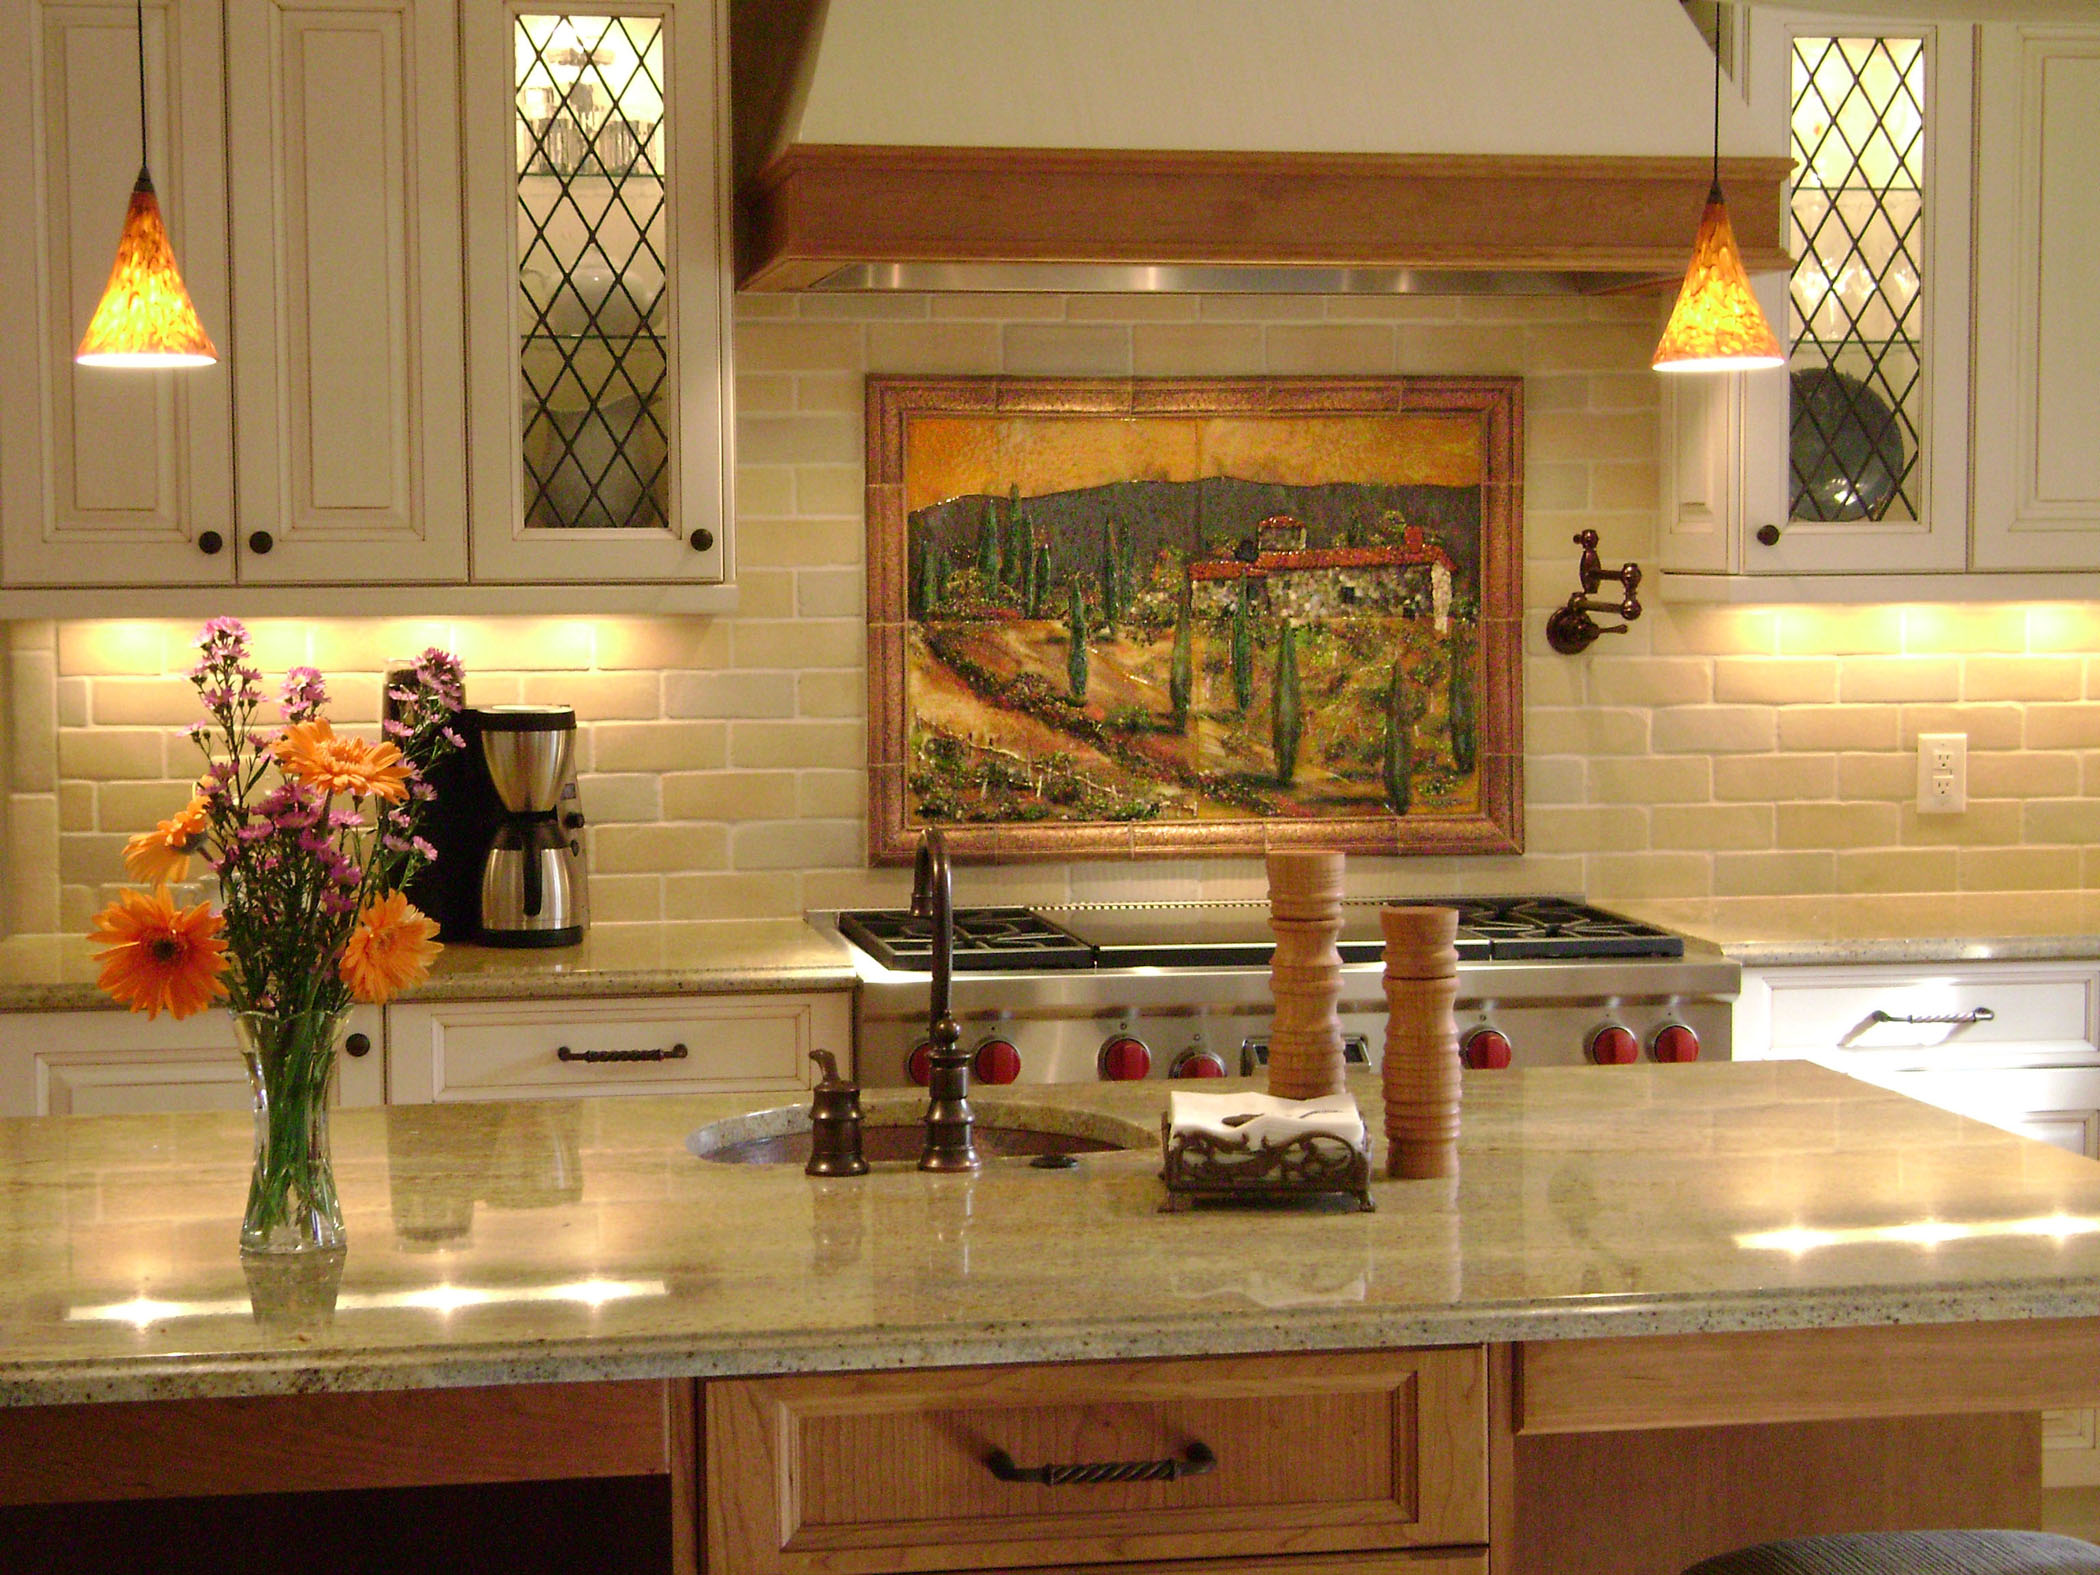 Decorative tile backsplash kitchen